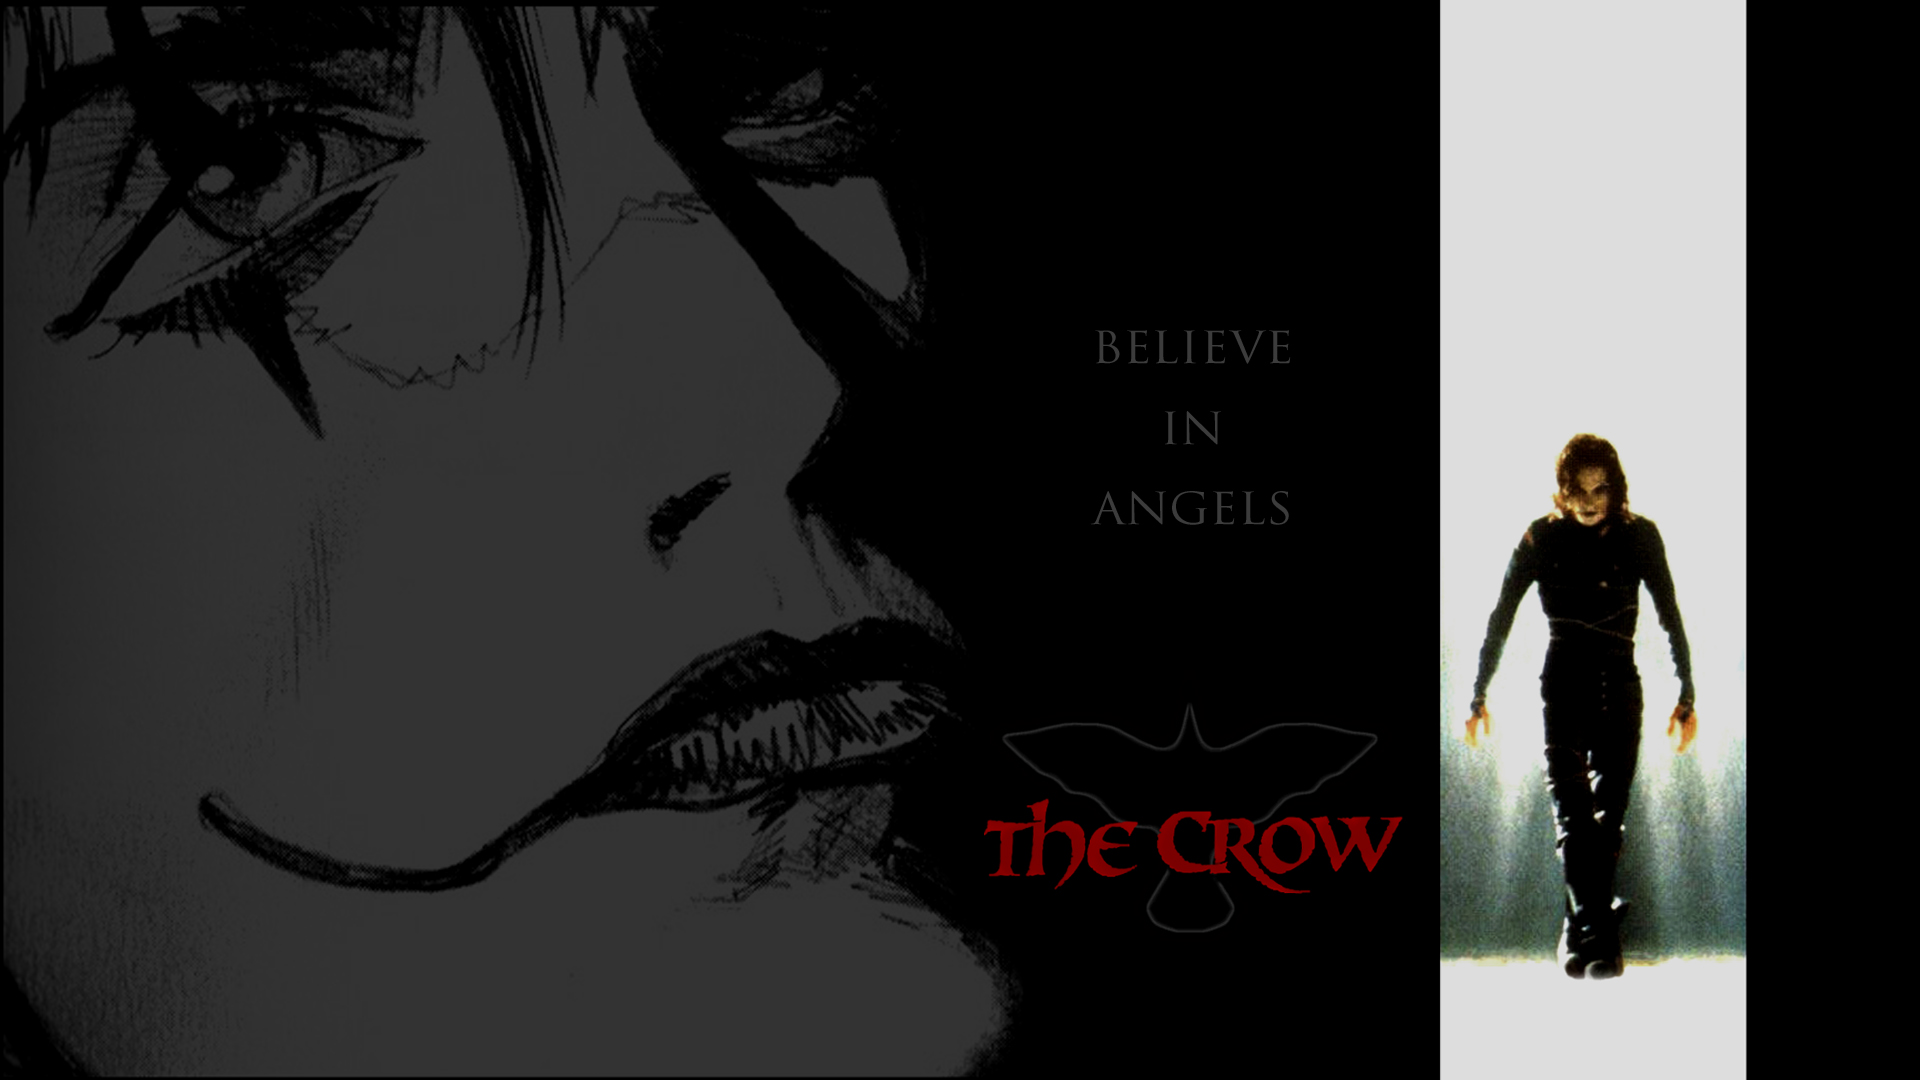 The Crow Quotes. QuotesGram